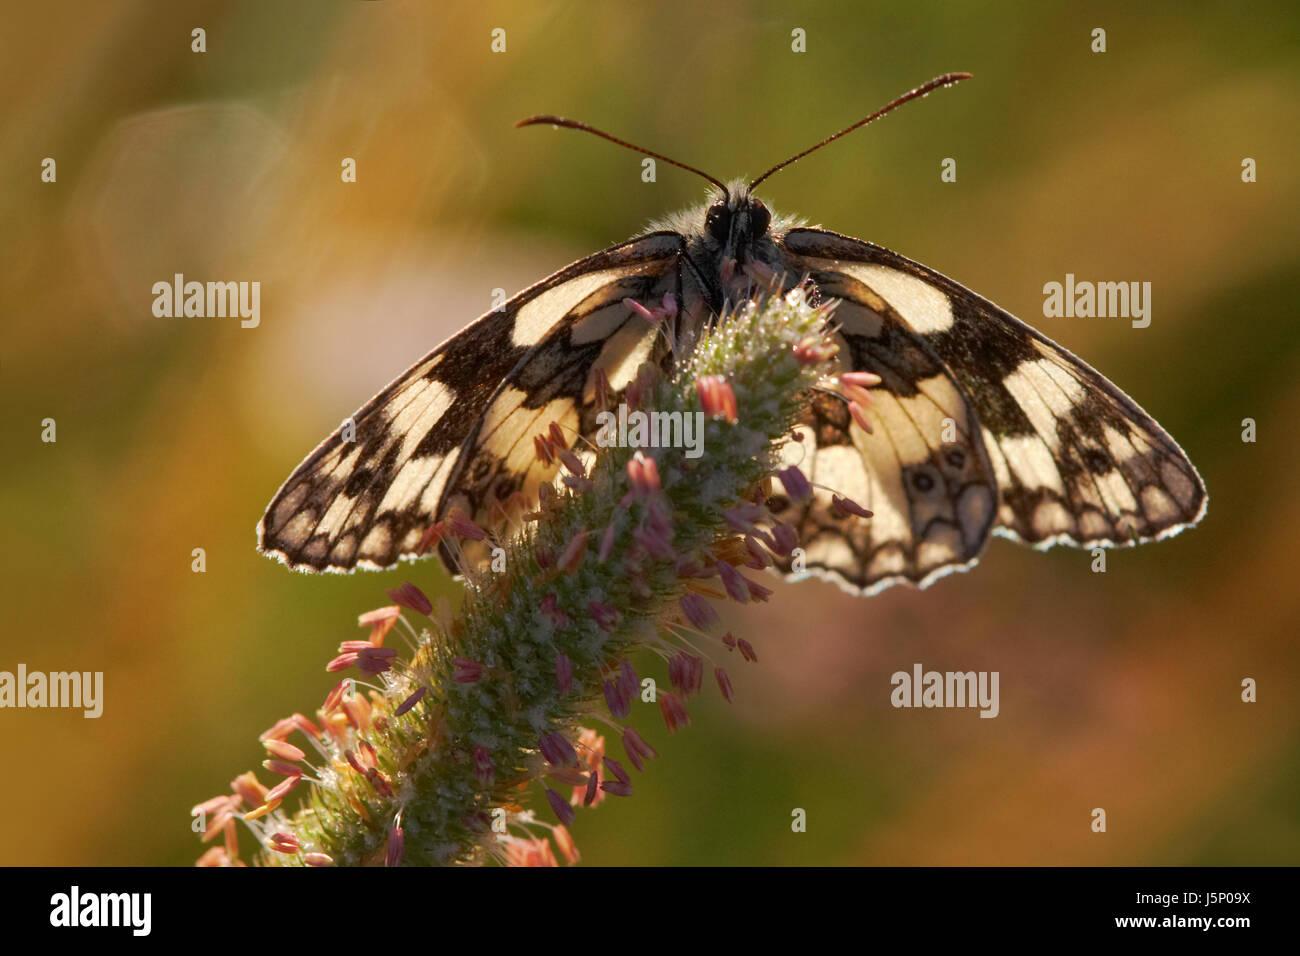 shine shines bright lucent light serene luminous macro close-up macro admission - Stock Image